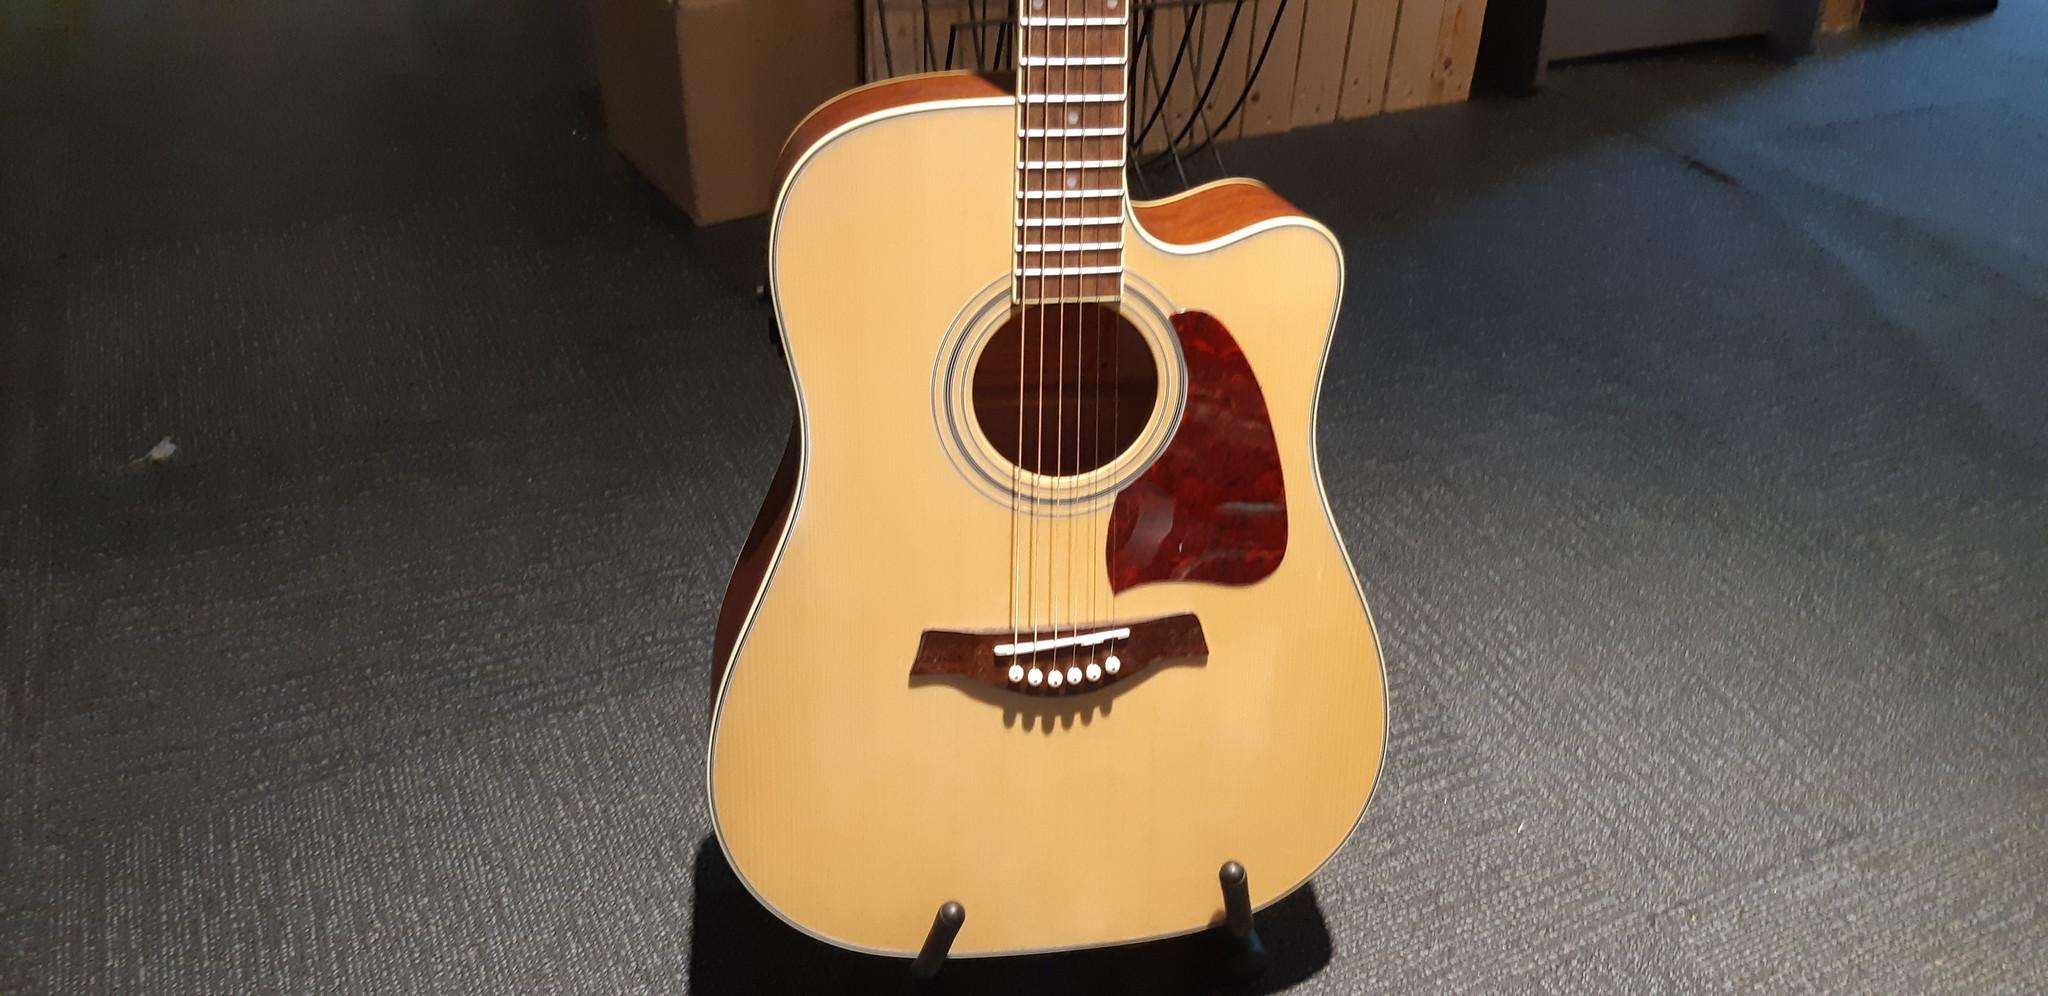 richwood RD-16-CE Richwood Artist Series akoestische gitaar